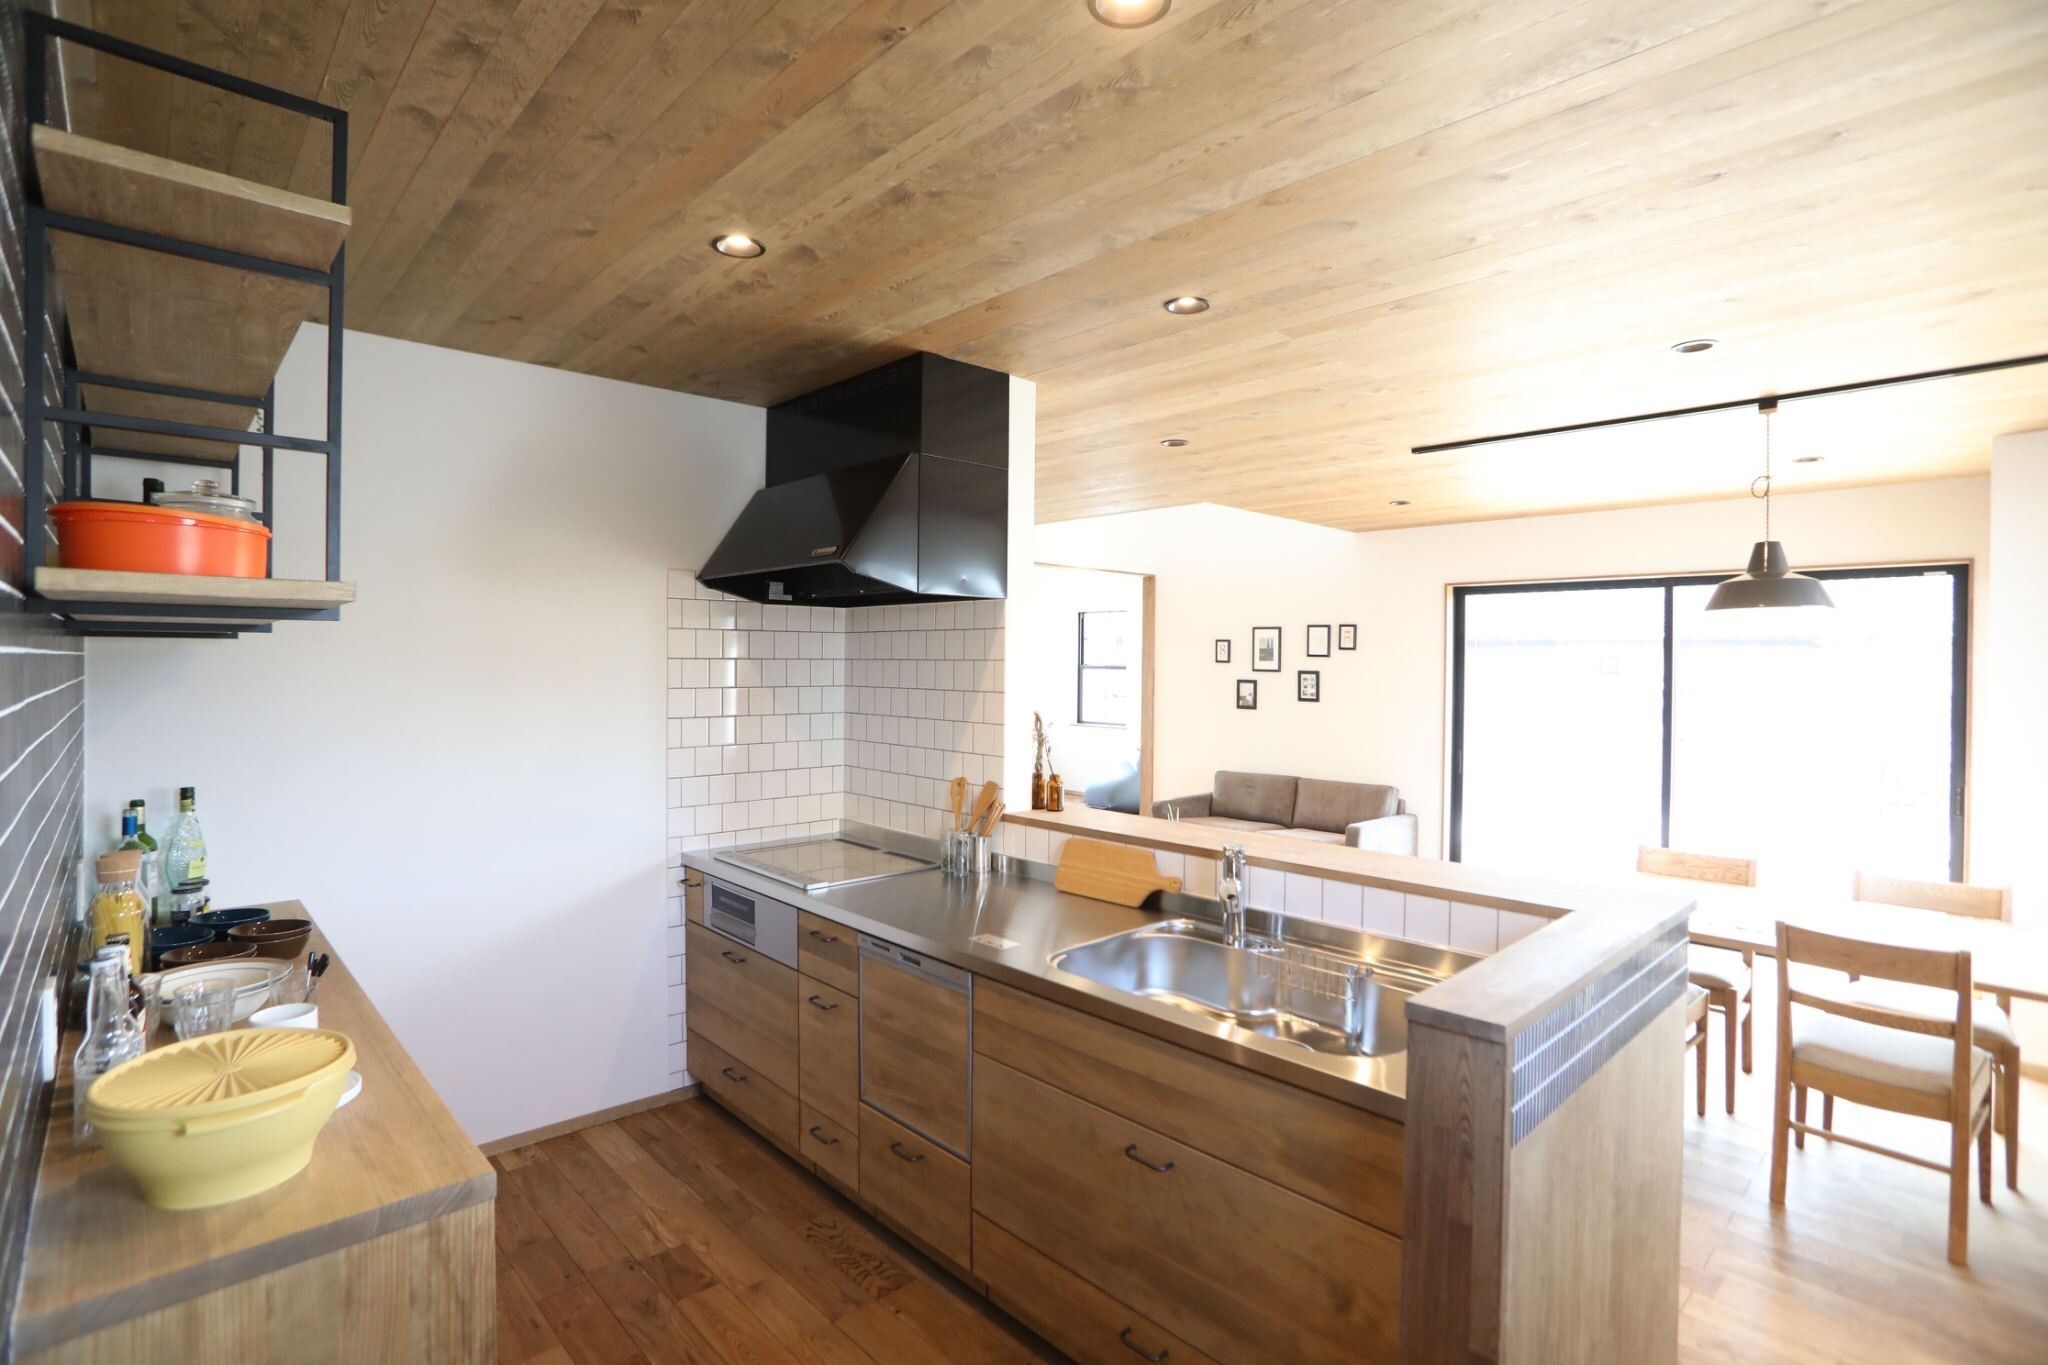 Opthome オプトホーム 木製キッチン 天井板張り オリジナルキッチン